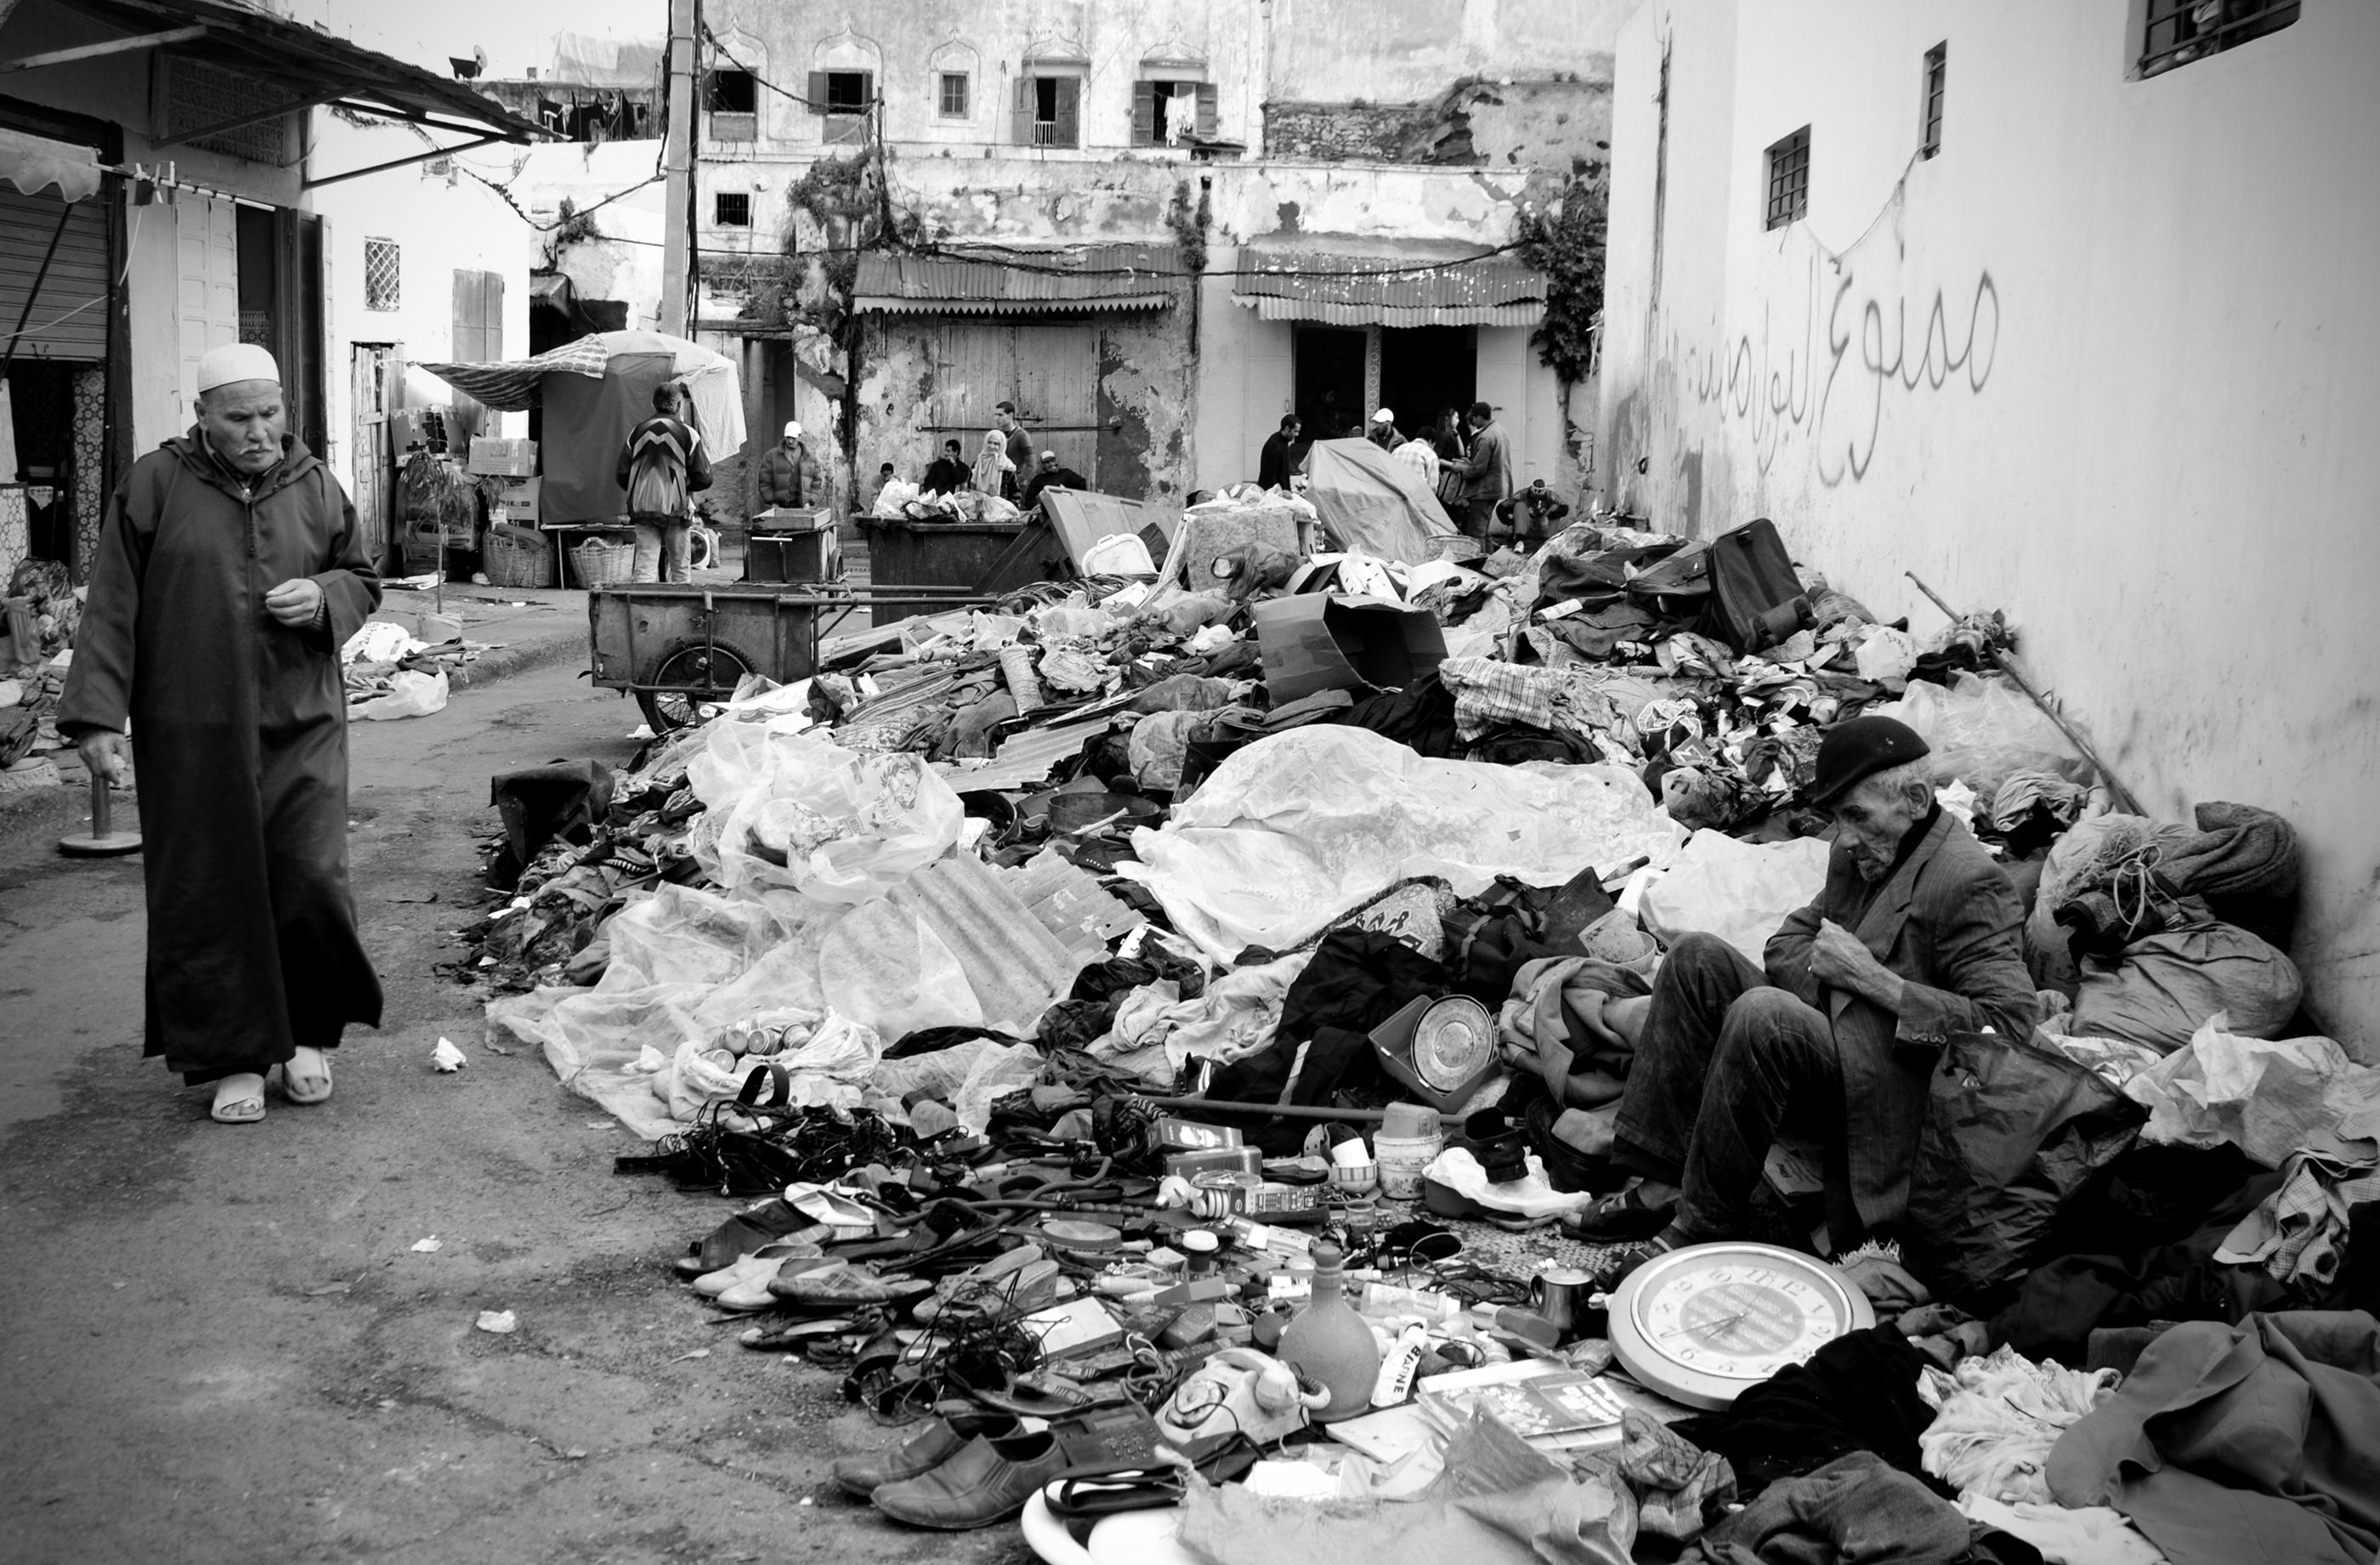 FLEA MARKET Rabat, Morocco